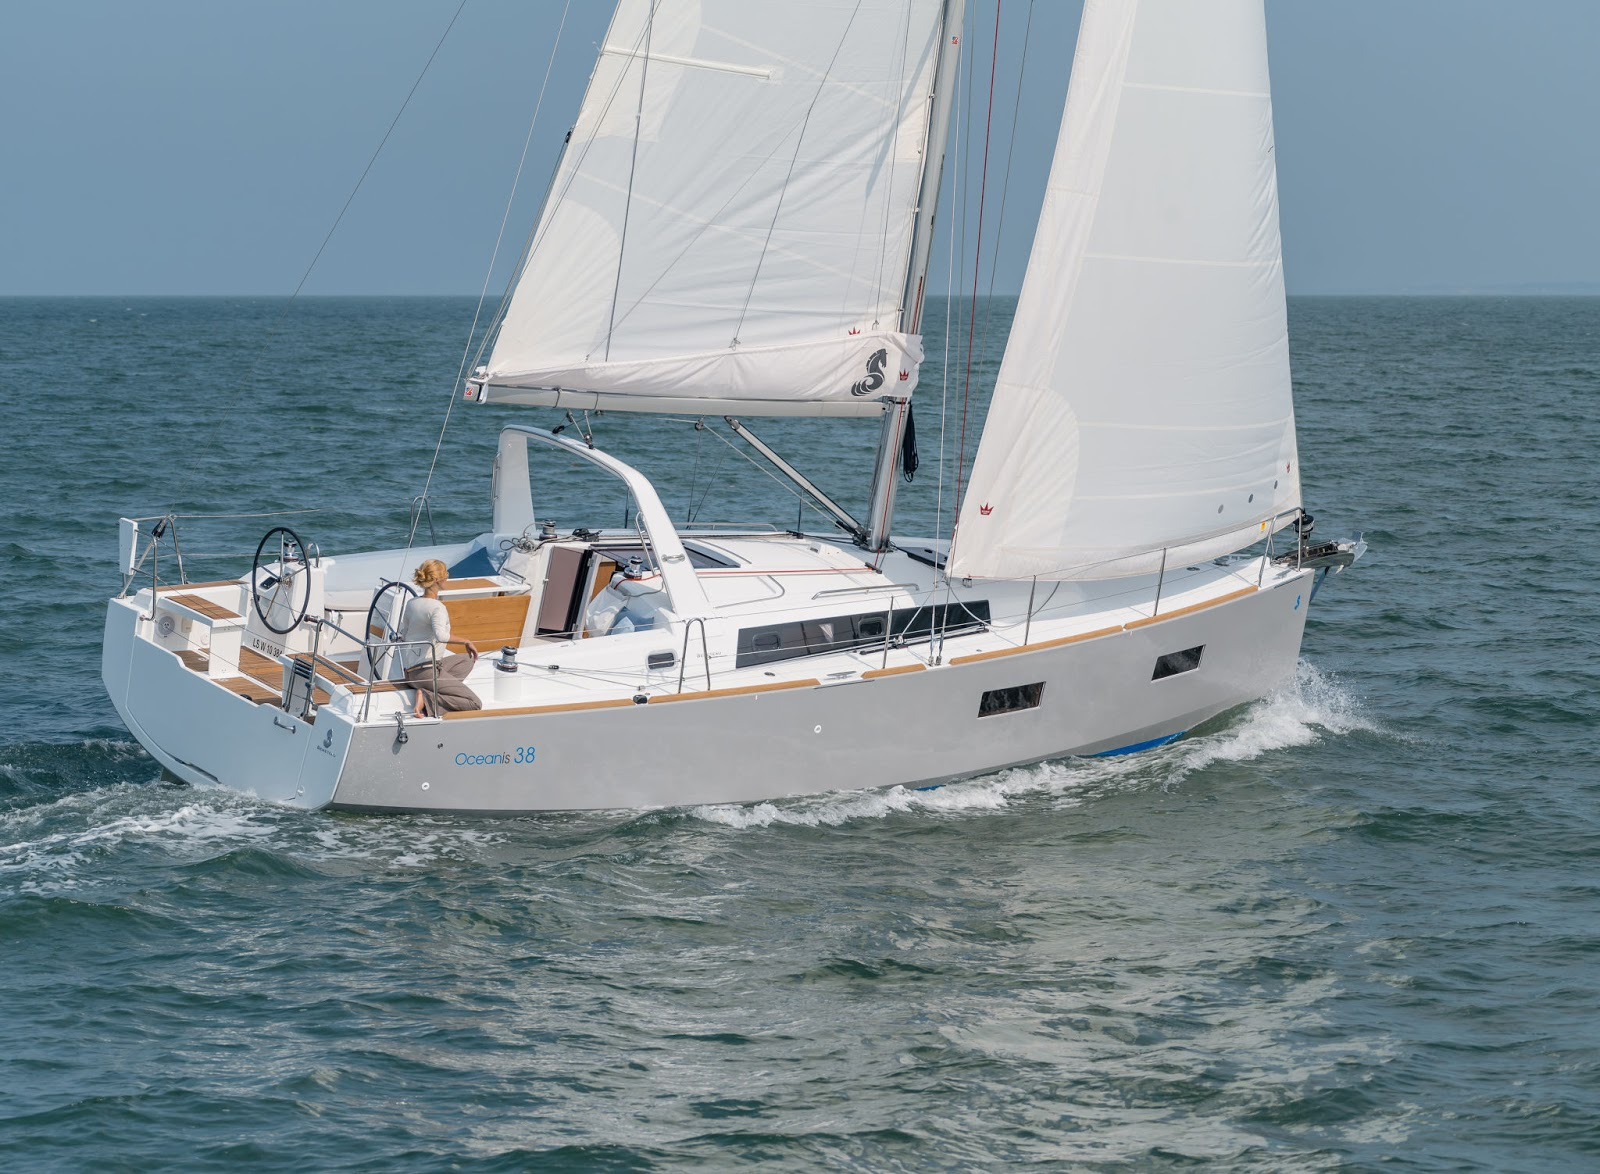 alquiler de veleros baratos en ibiza alquiler veleros baratos ibiza alquiler de barcos baratos